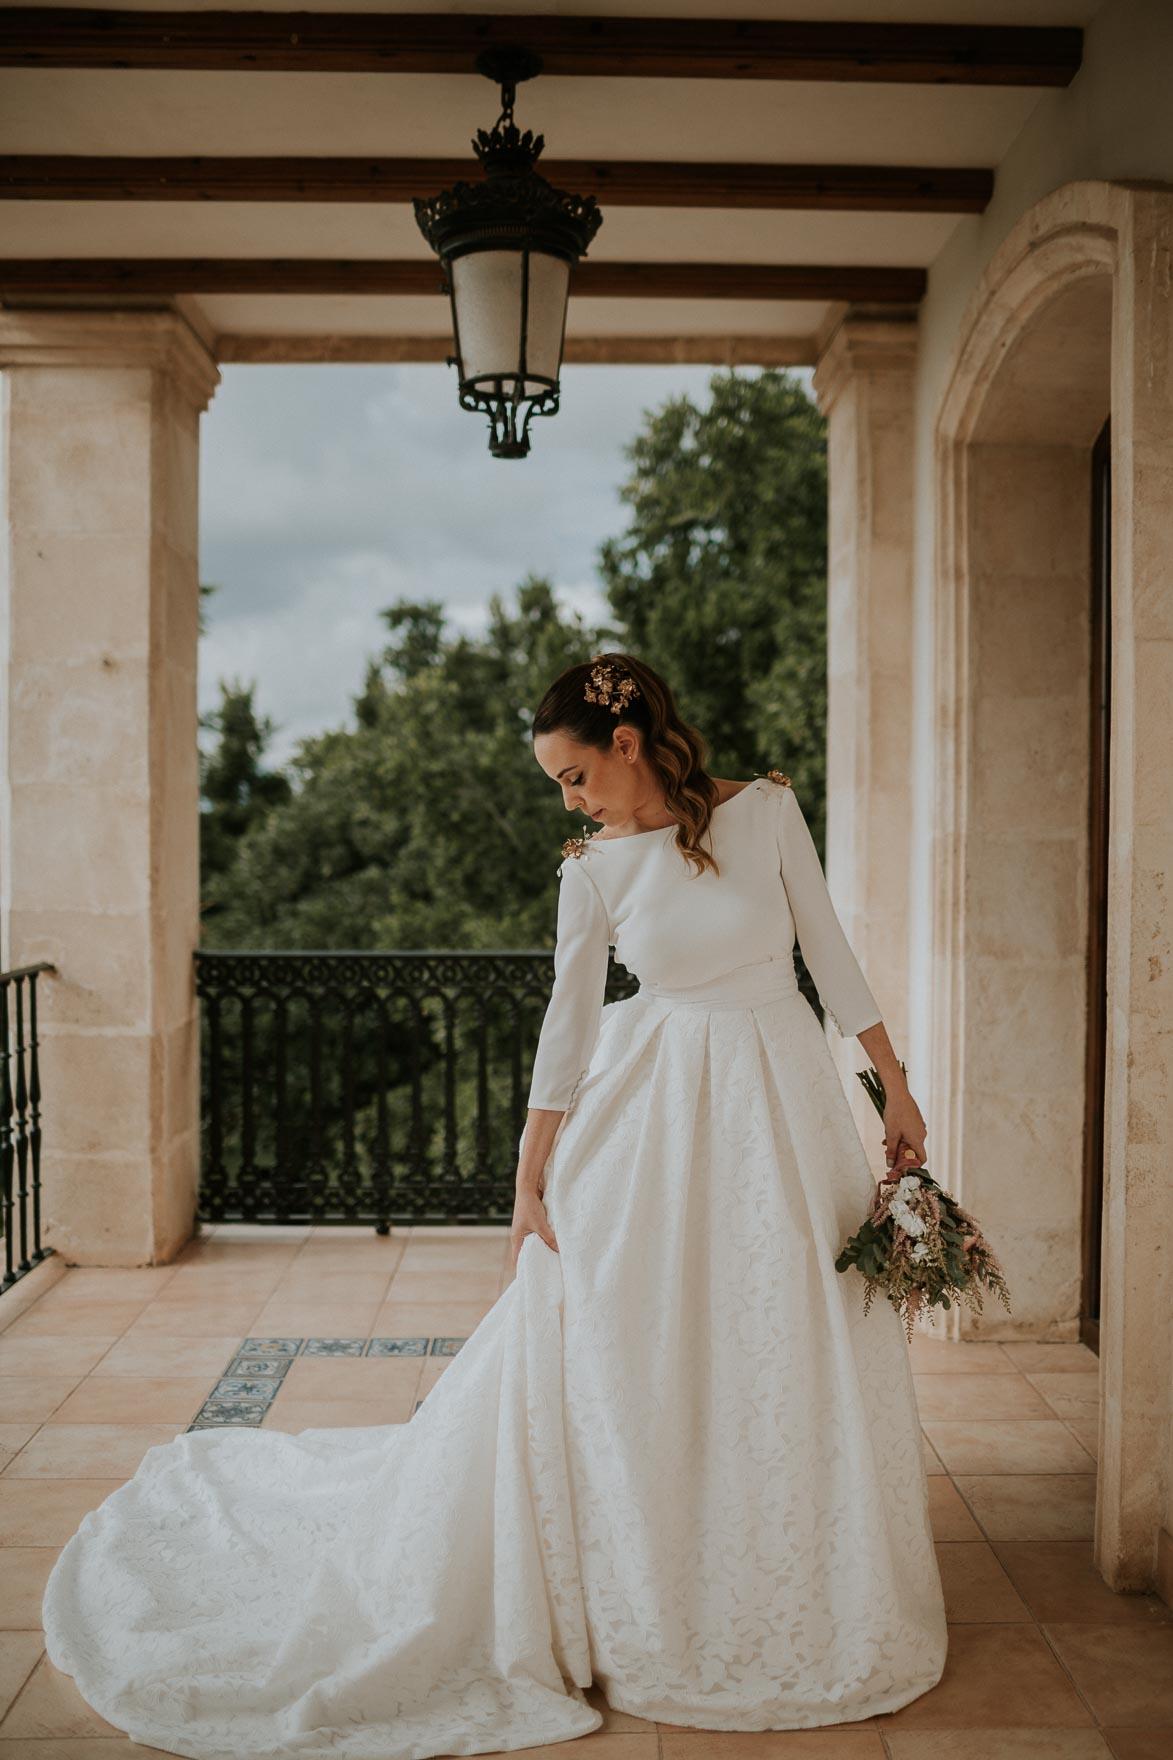 Vestido de Novia con Sobre Falda Pronovias